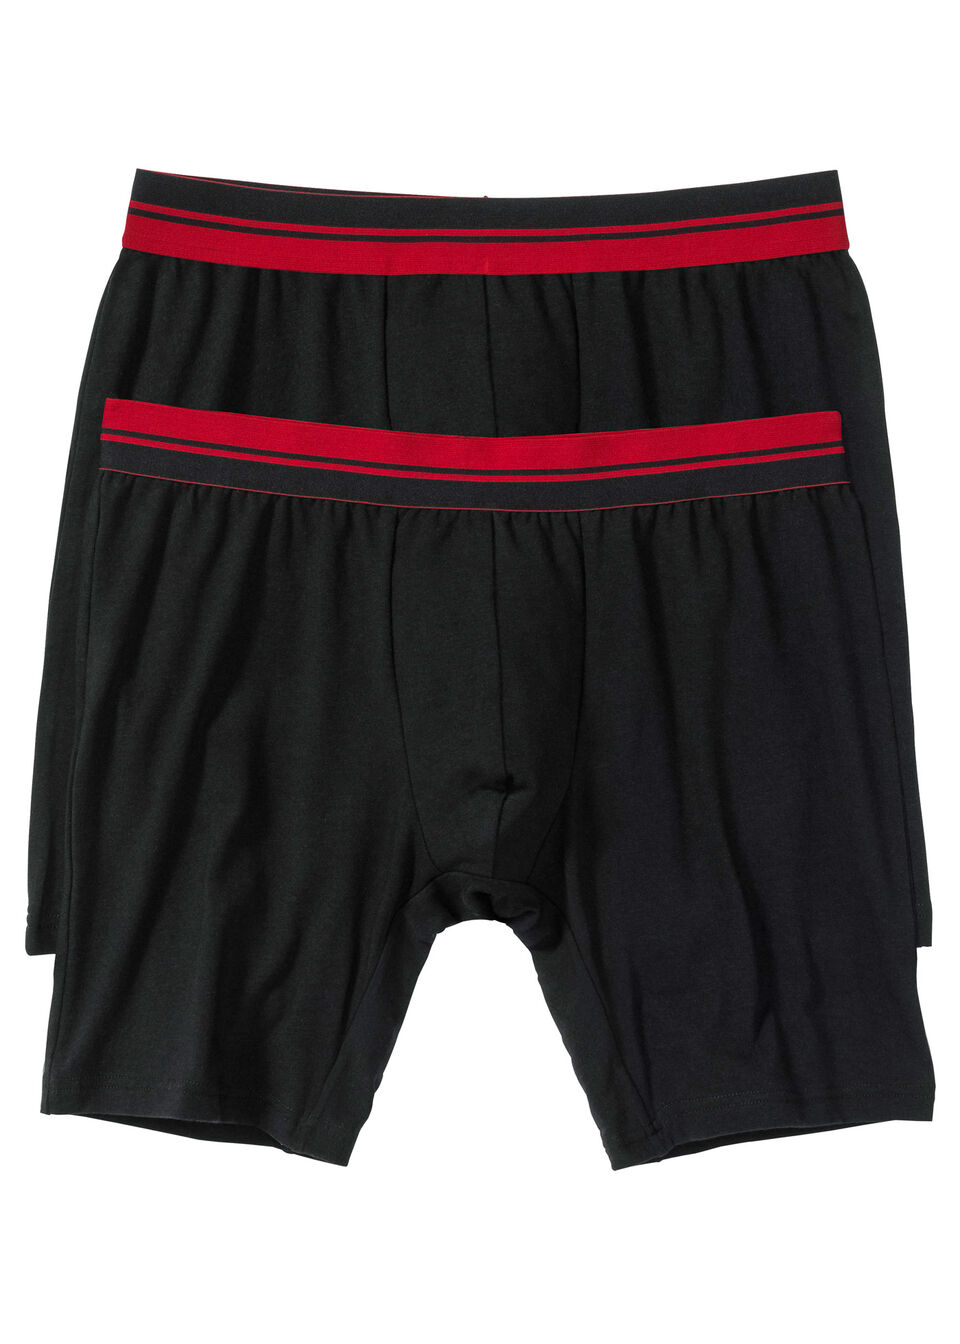 Boxeri lungi (2buc/pac) bonprix